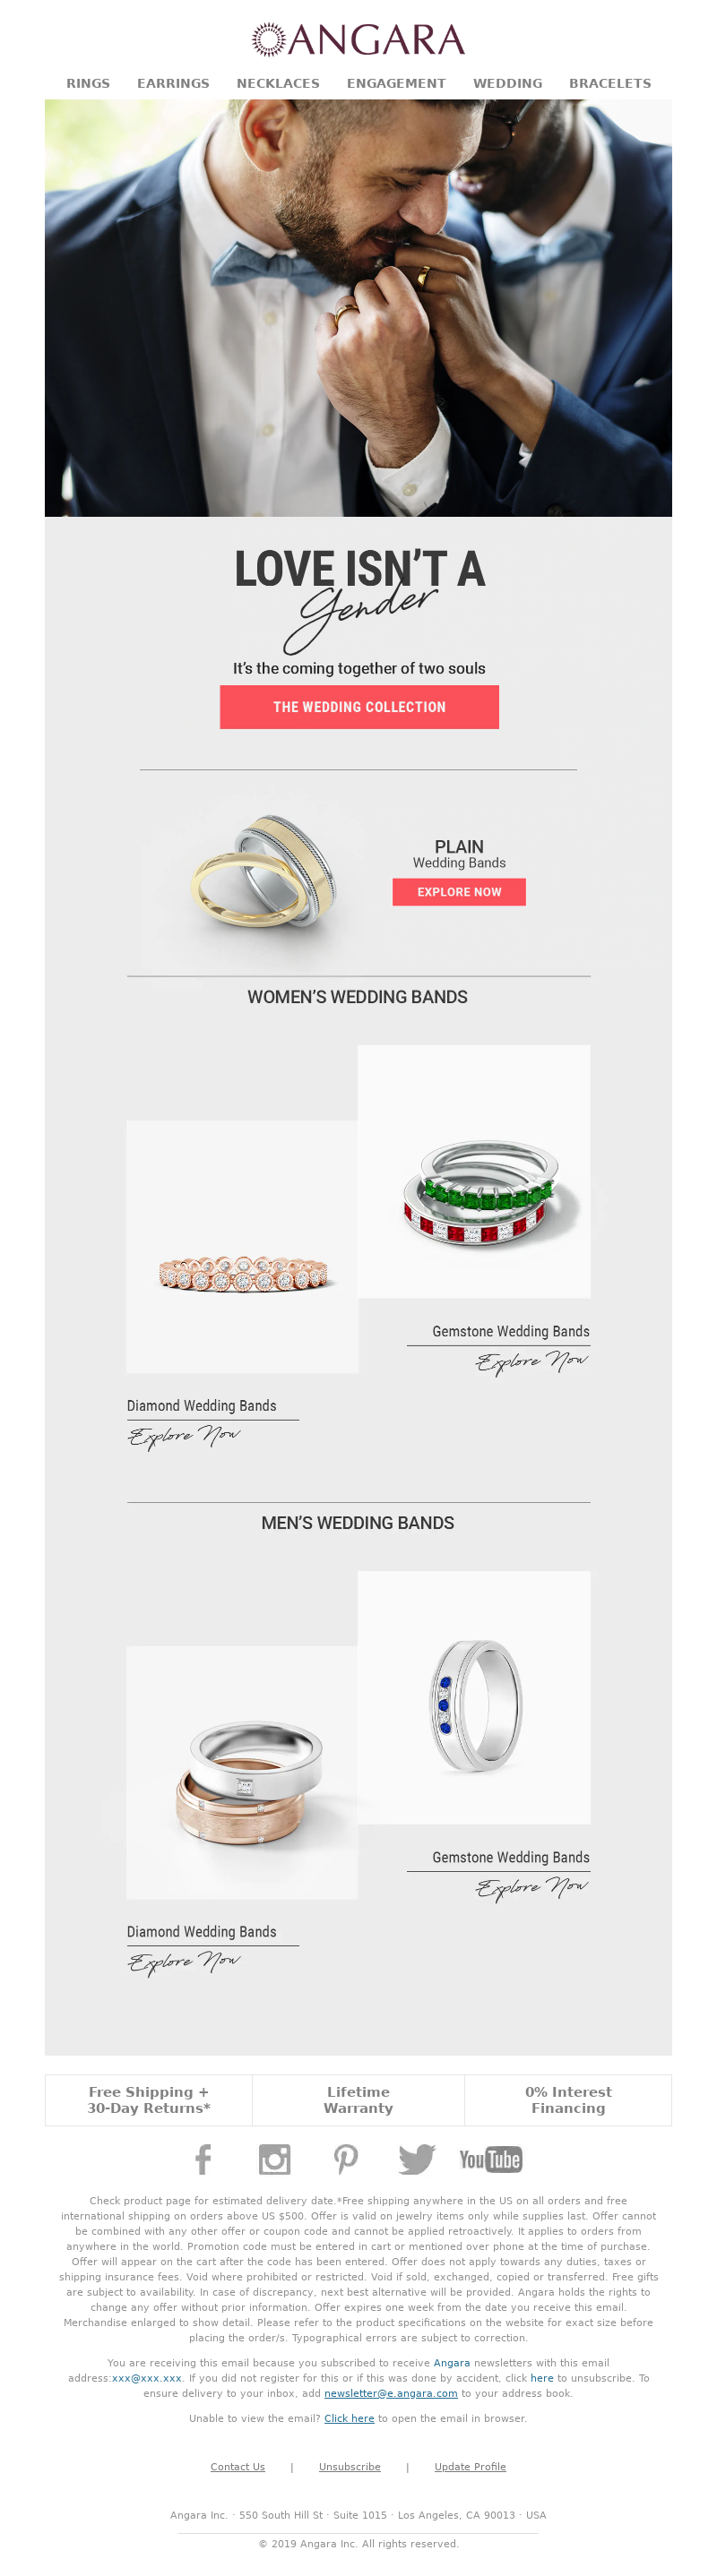 Angara email promoting jewelry